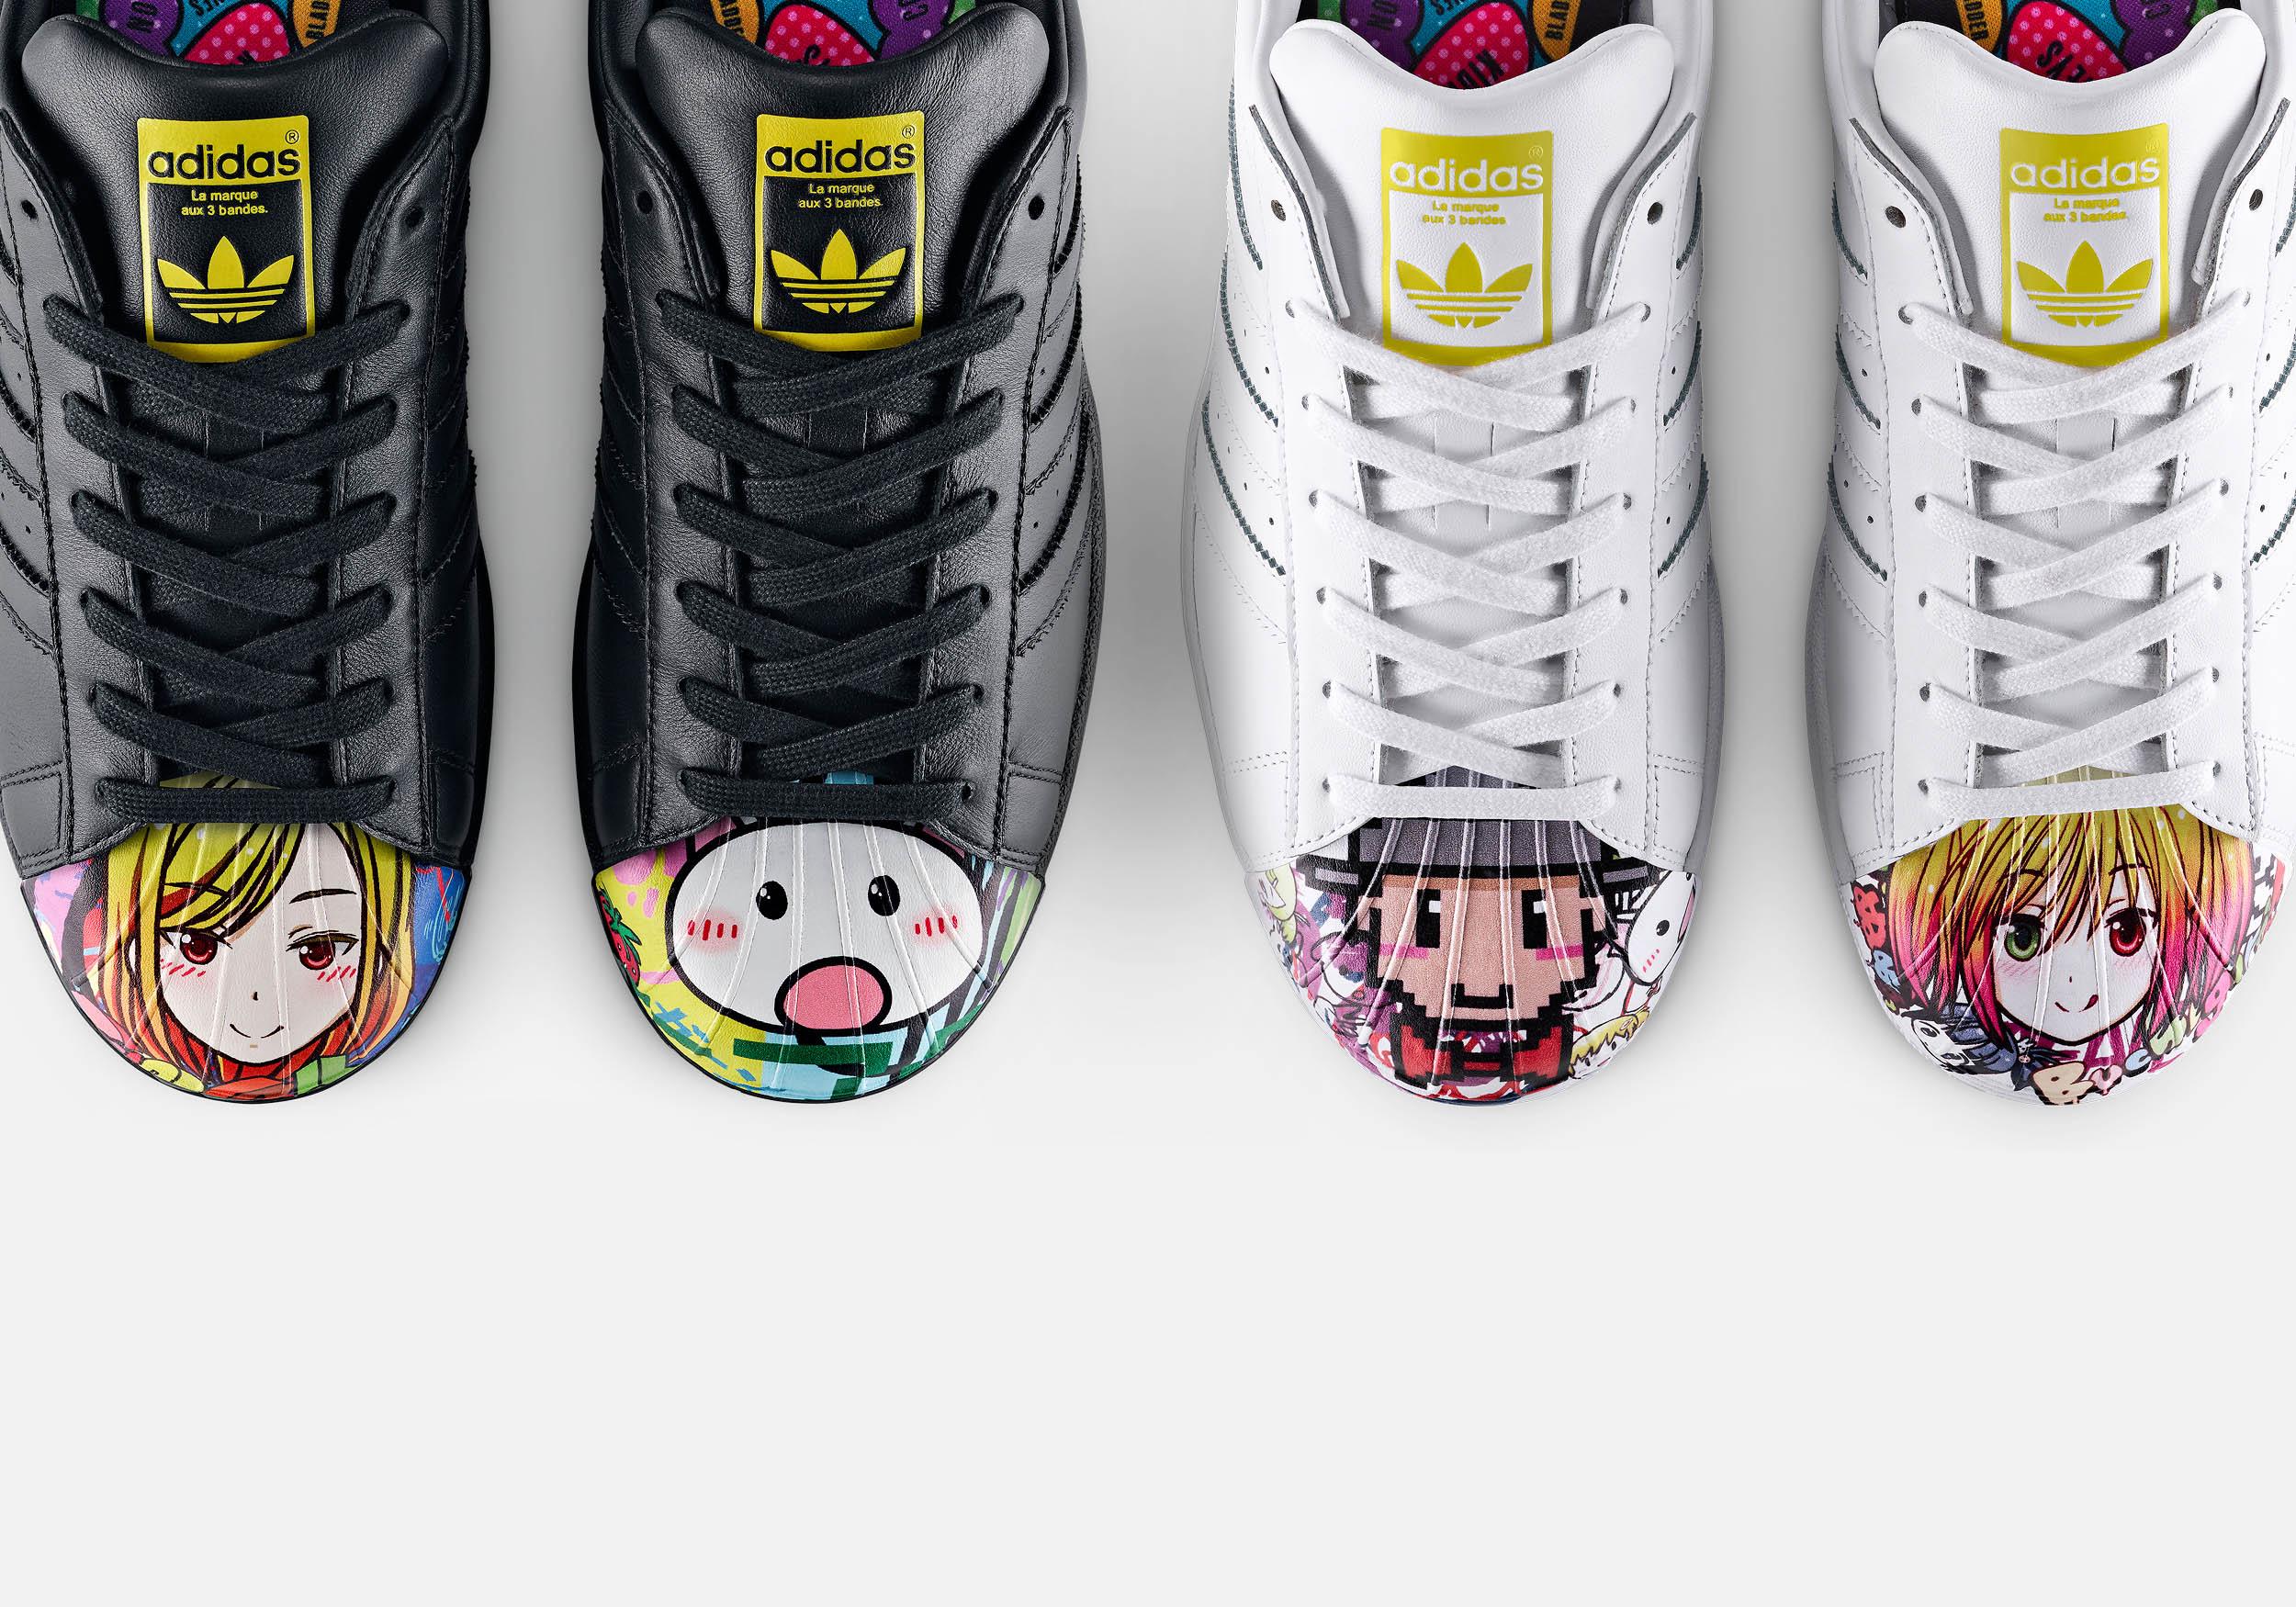 Adidas Supershell Pharrell Williams